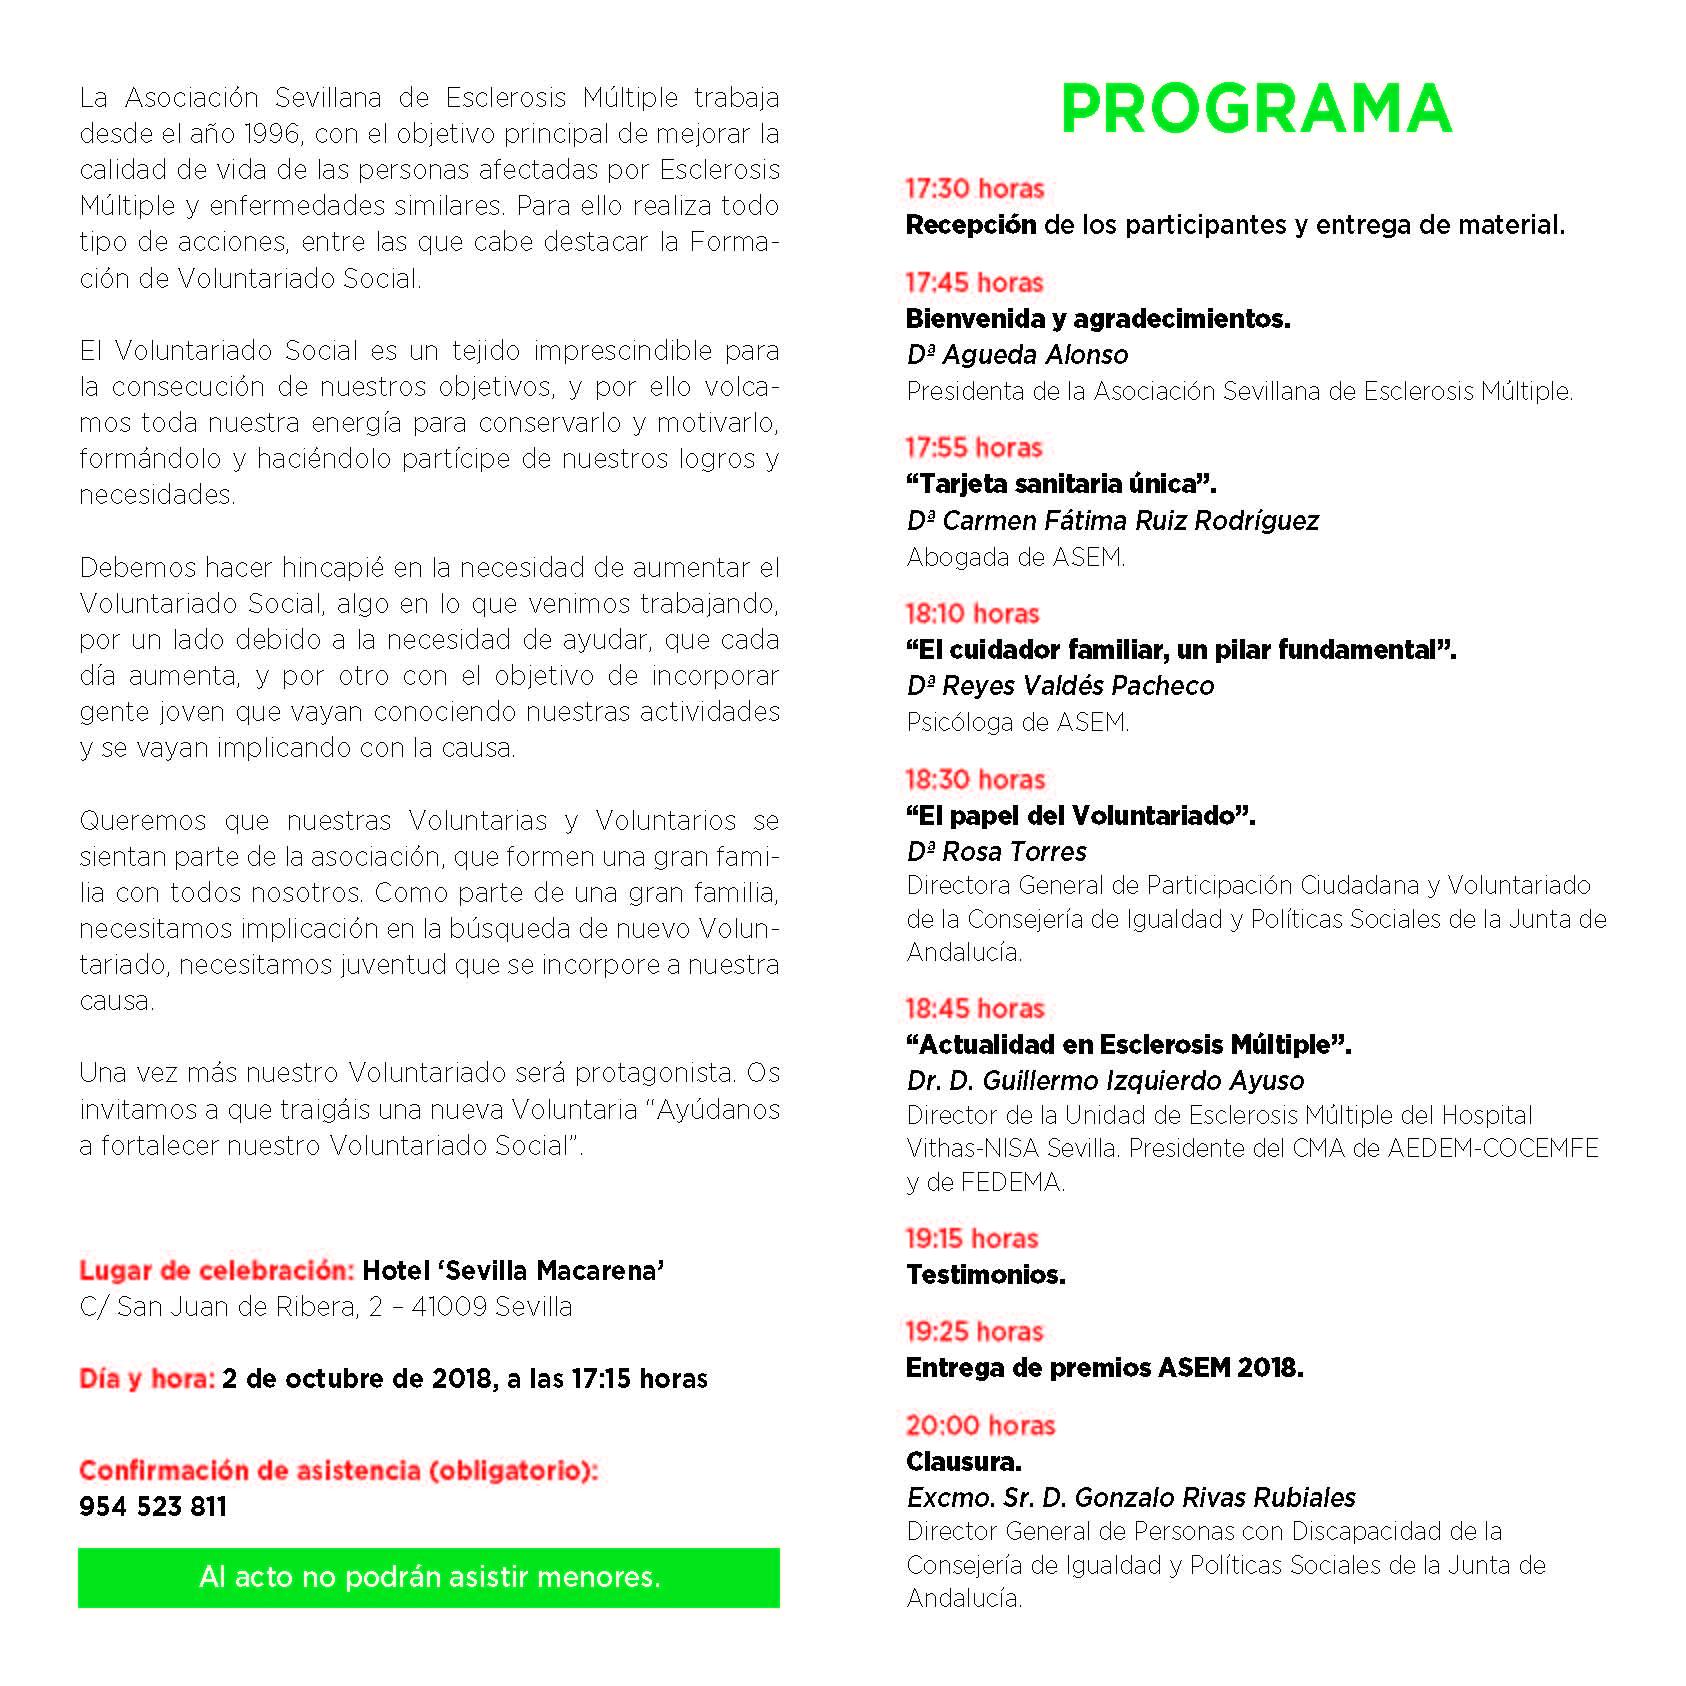 diptico xxi jornada de voluntariado - 2018_pagina_2.jpg